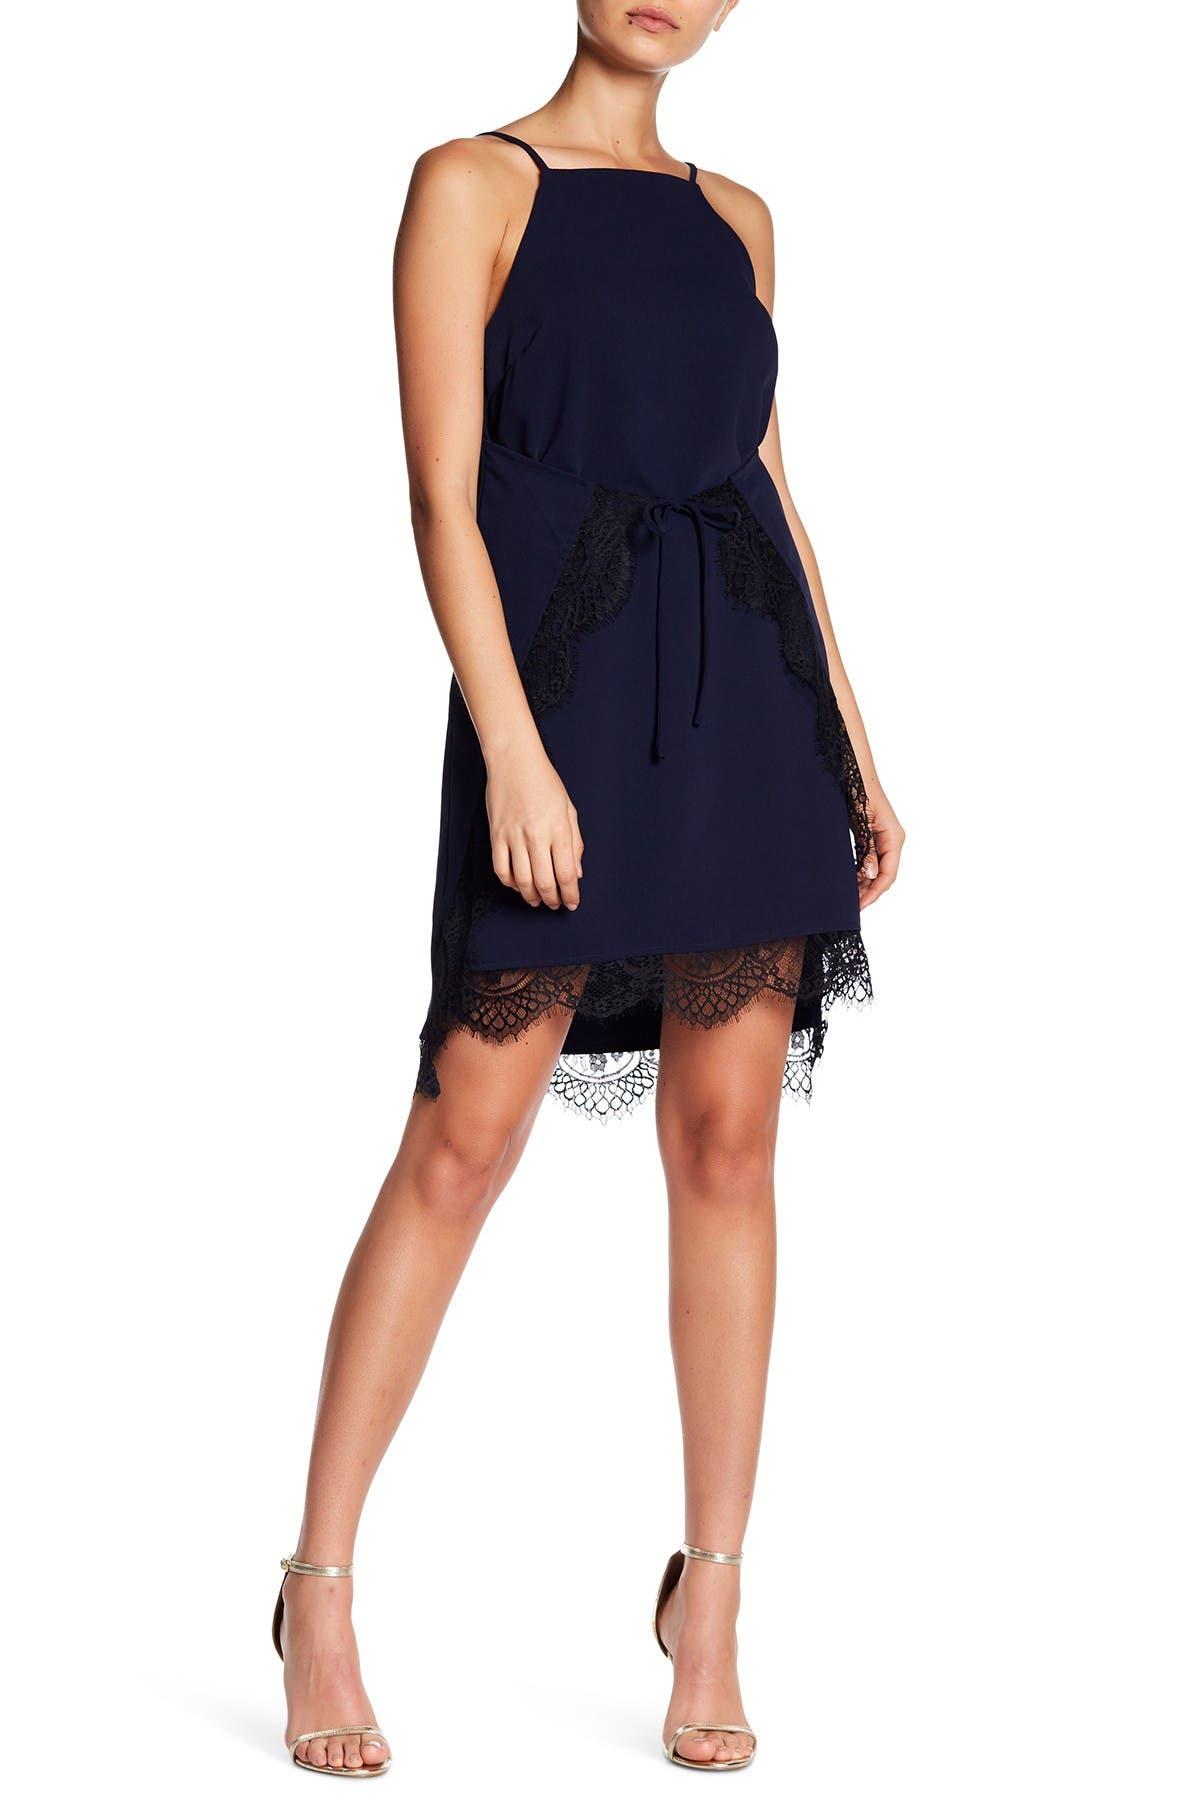 Image of Sugarlips Almee Lace Trim Slip Dress